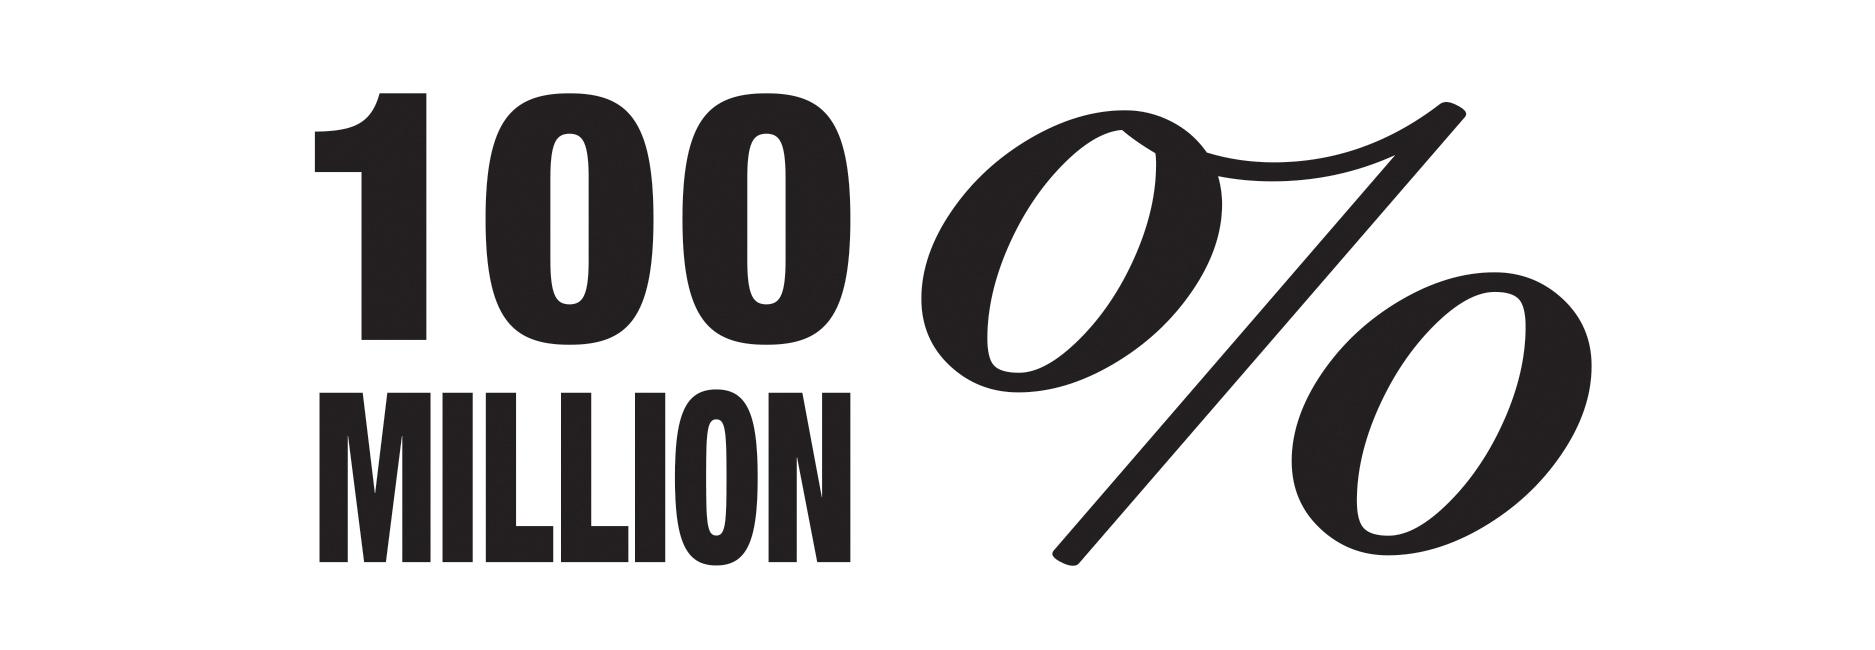 100 Million % title website.jpg